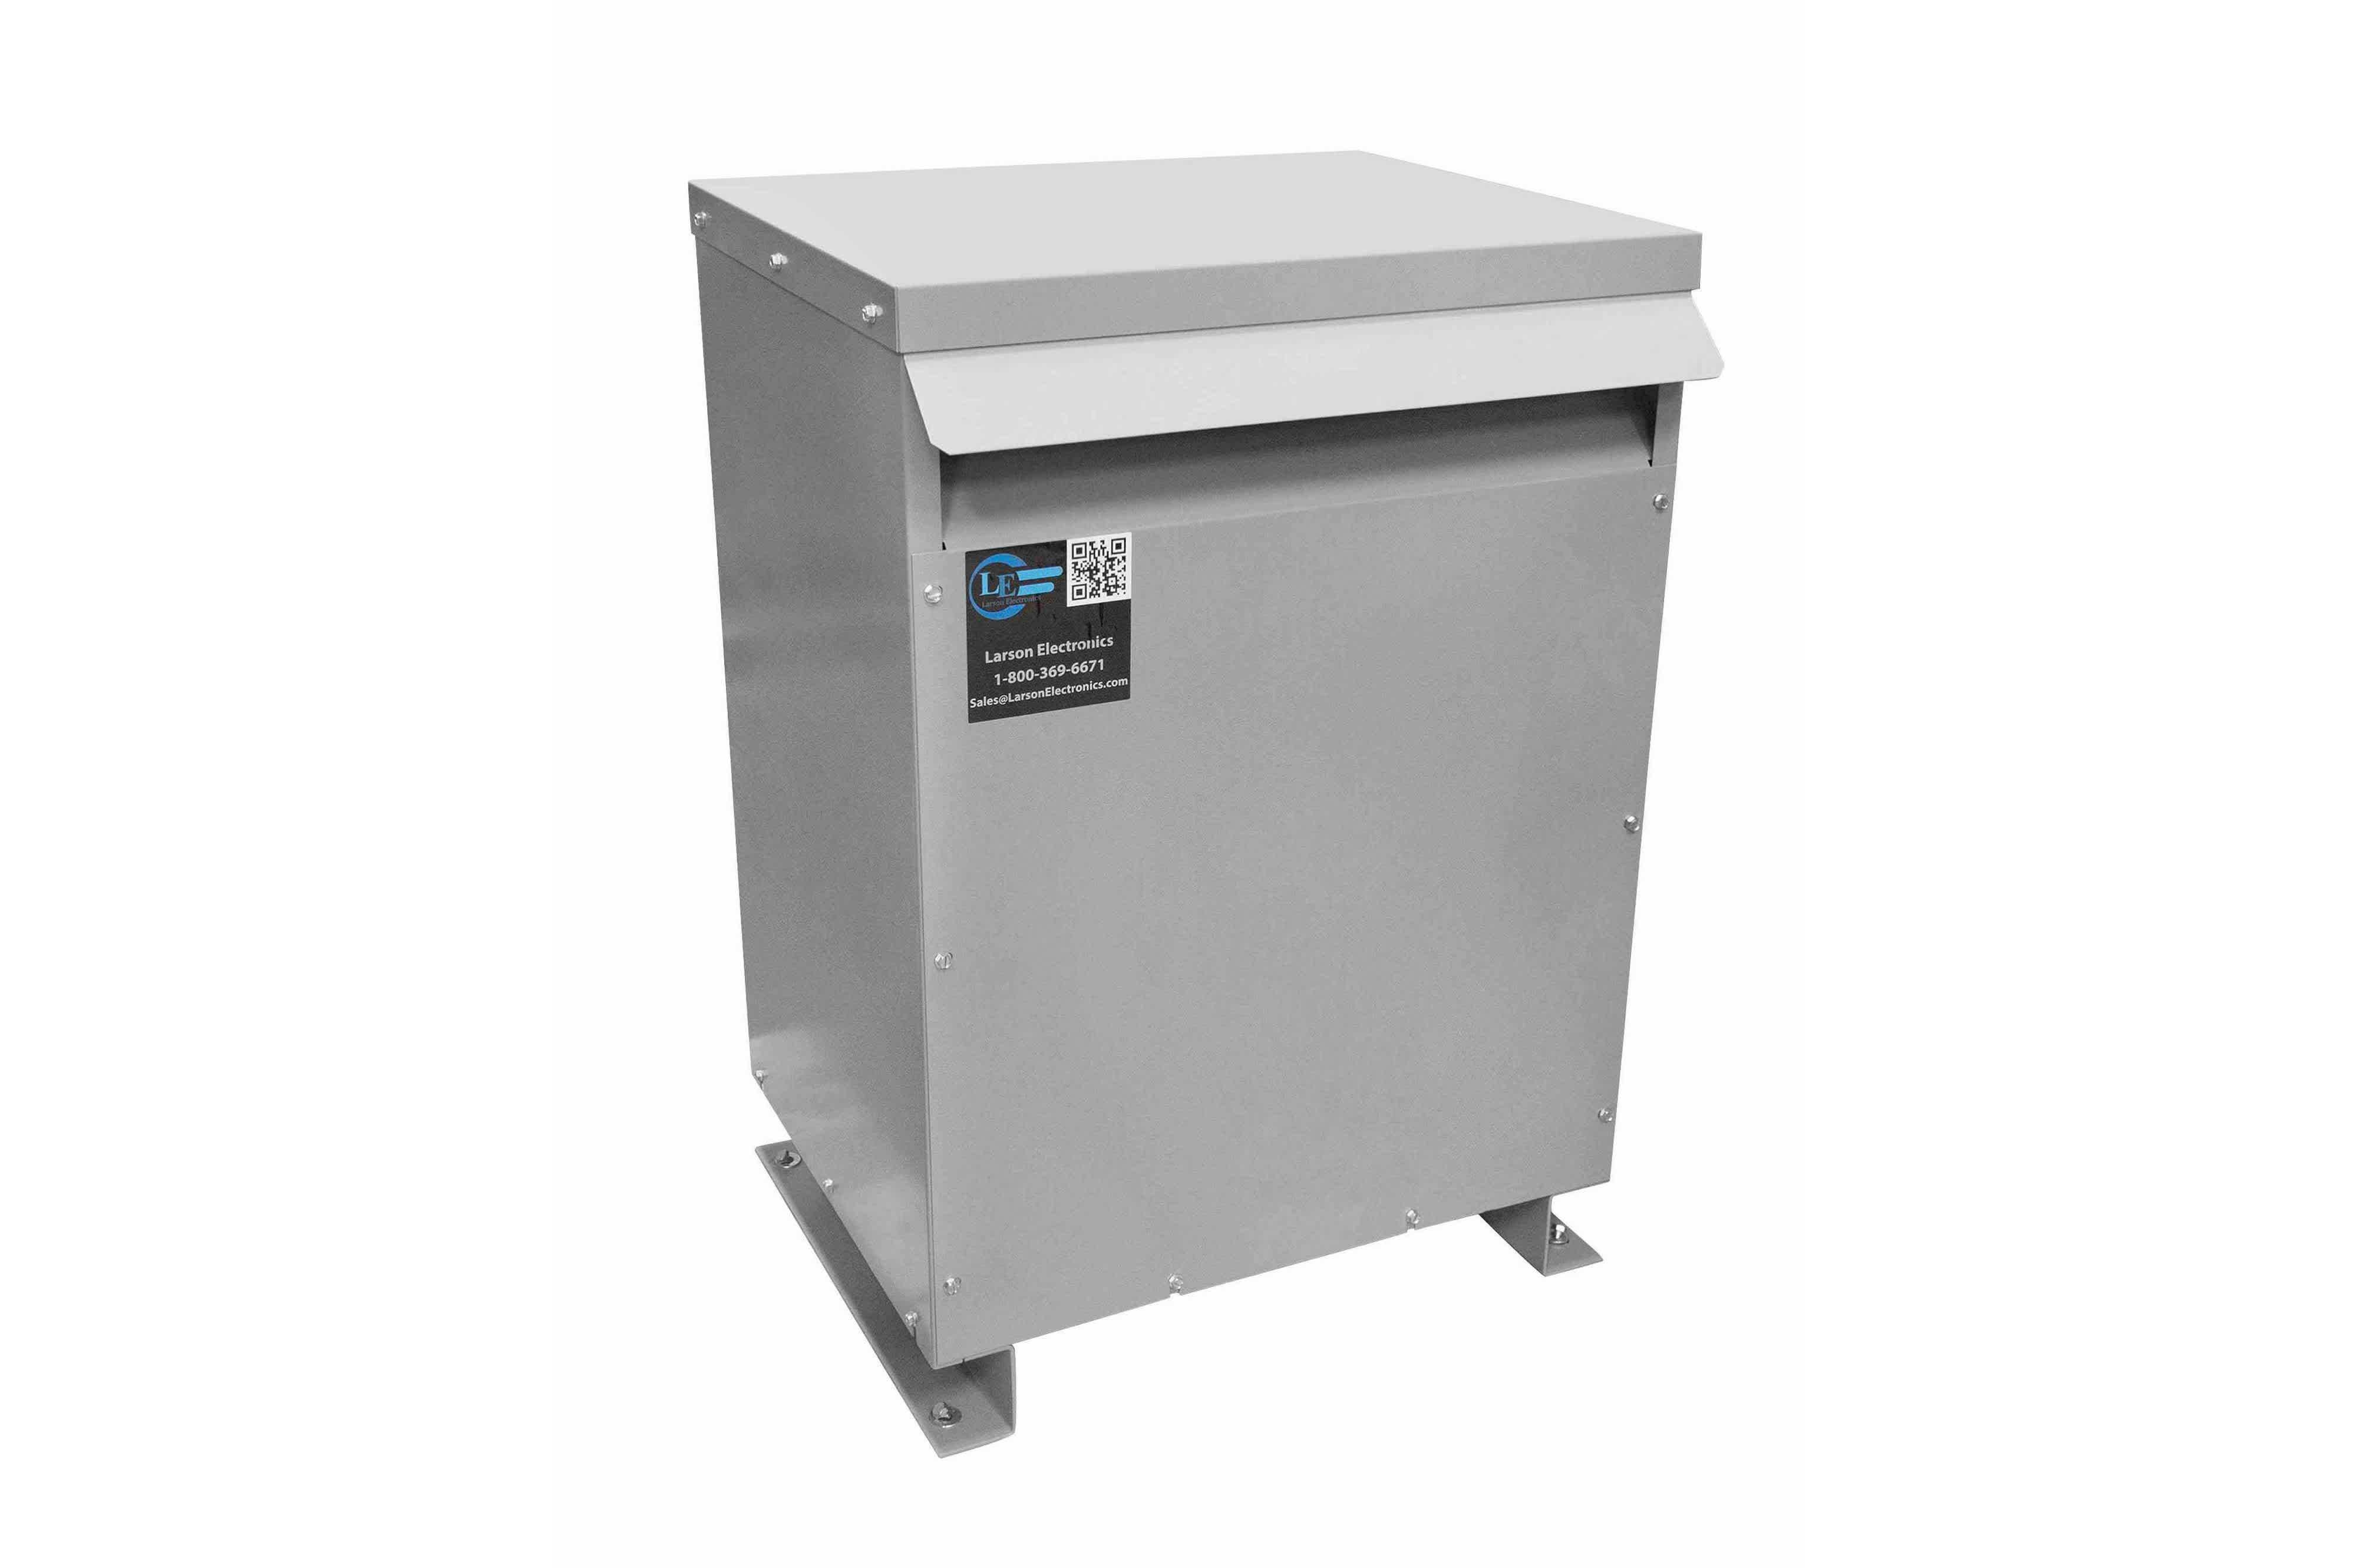 37.5 kVA 3PH Isolation Transformer, 480V Wye Primary, 240V Delta Secondary, N3R, Ventilated, 60 Hz